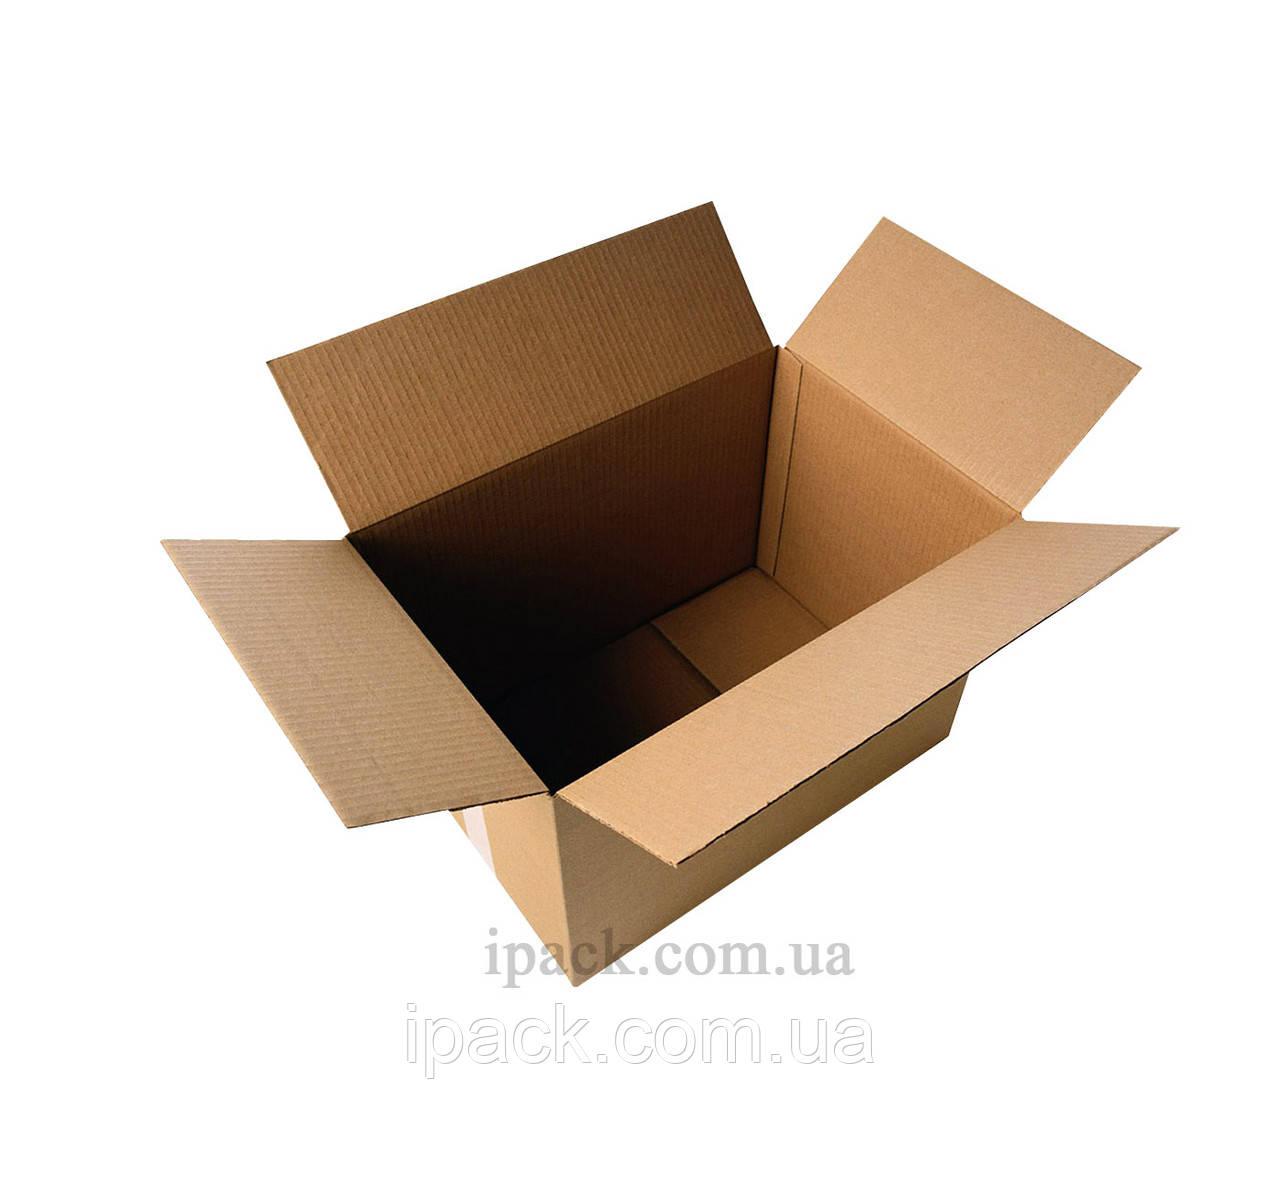 Гофроящик 570*455*280 мм, бурый, четырехклапанный картонный короб